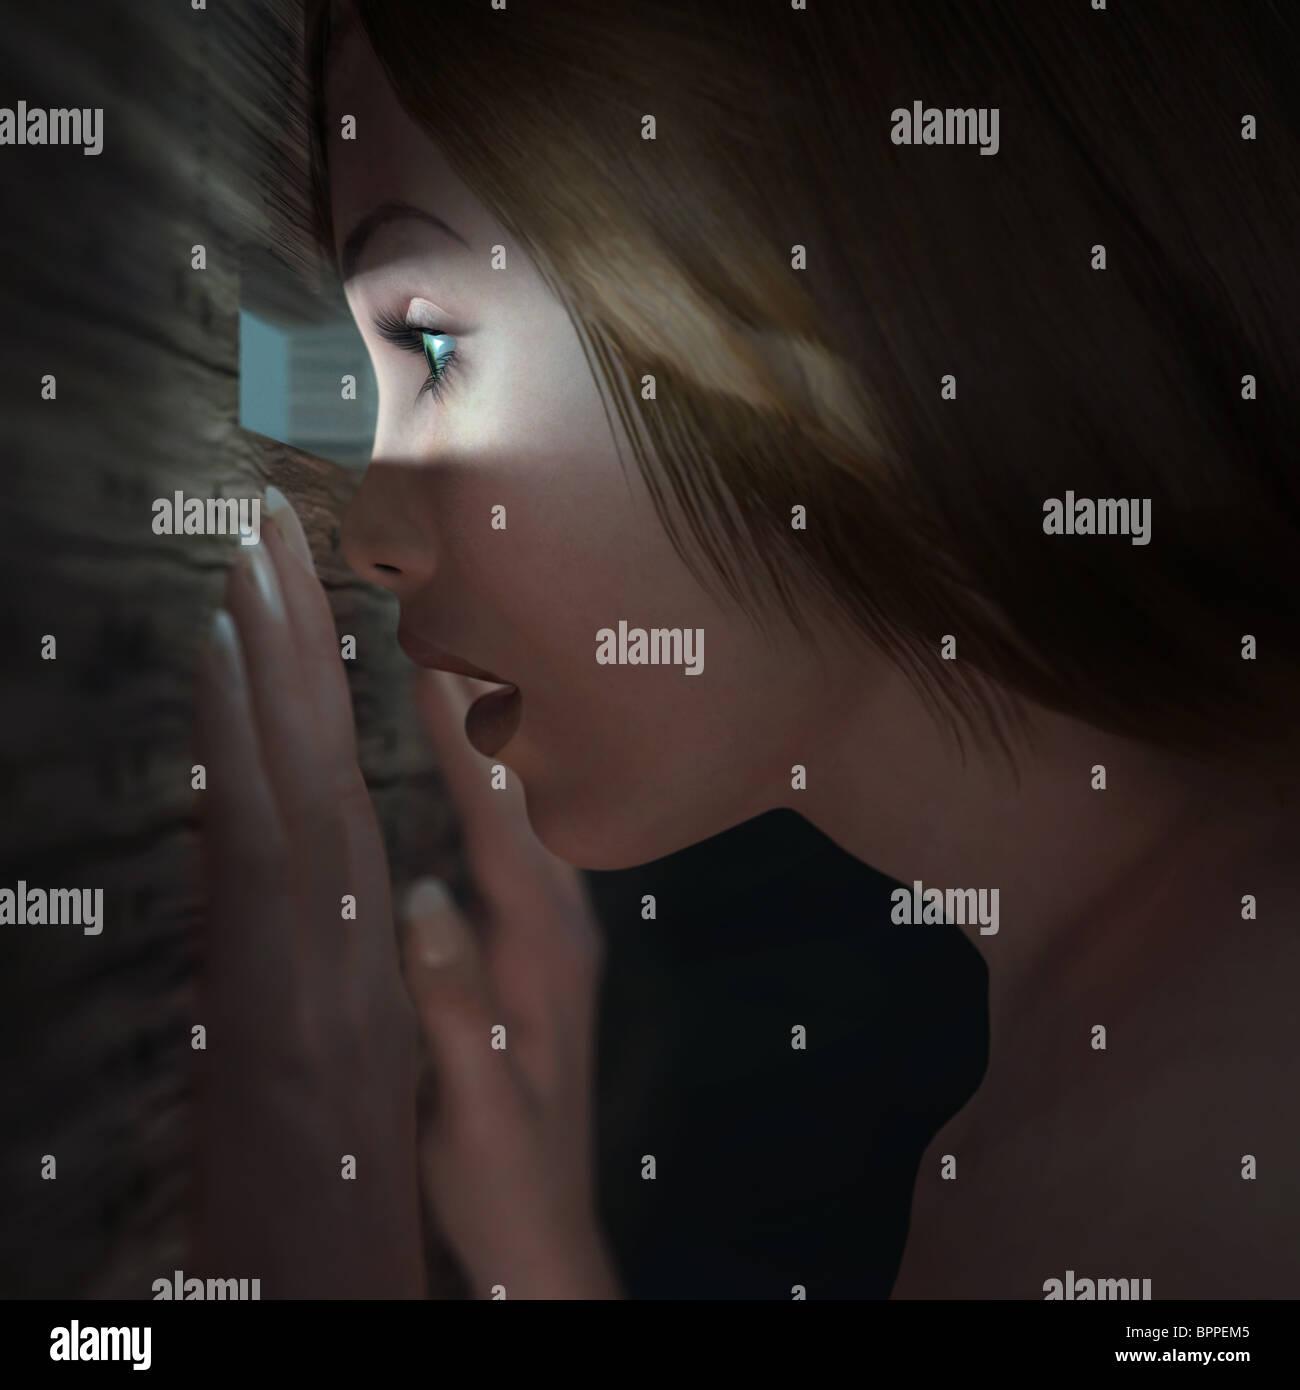 Spying woman - Stock Image